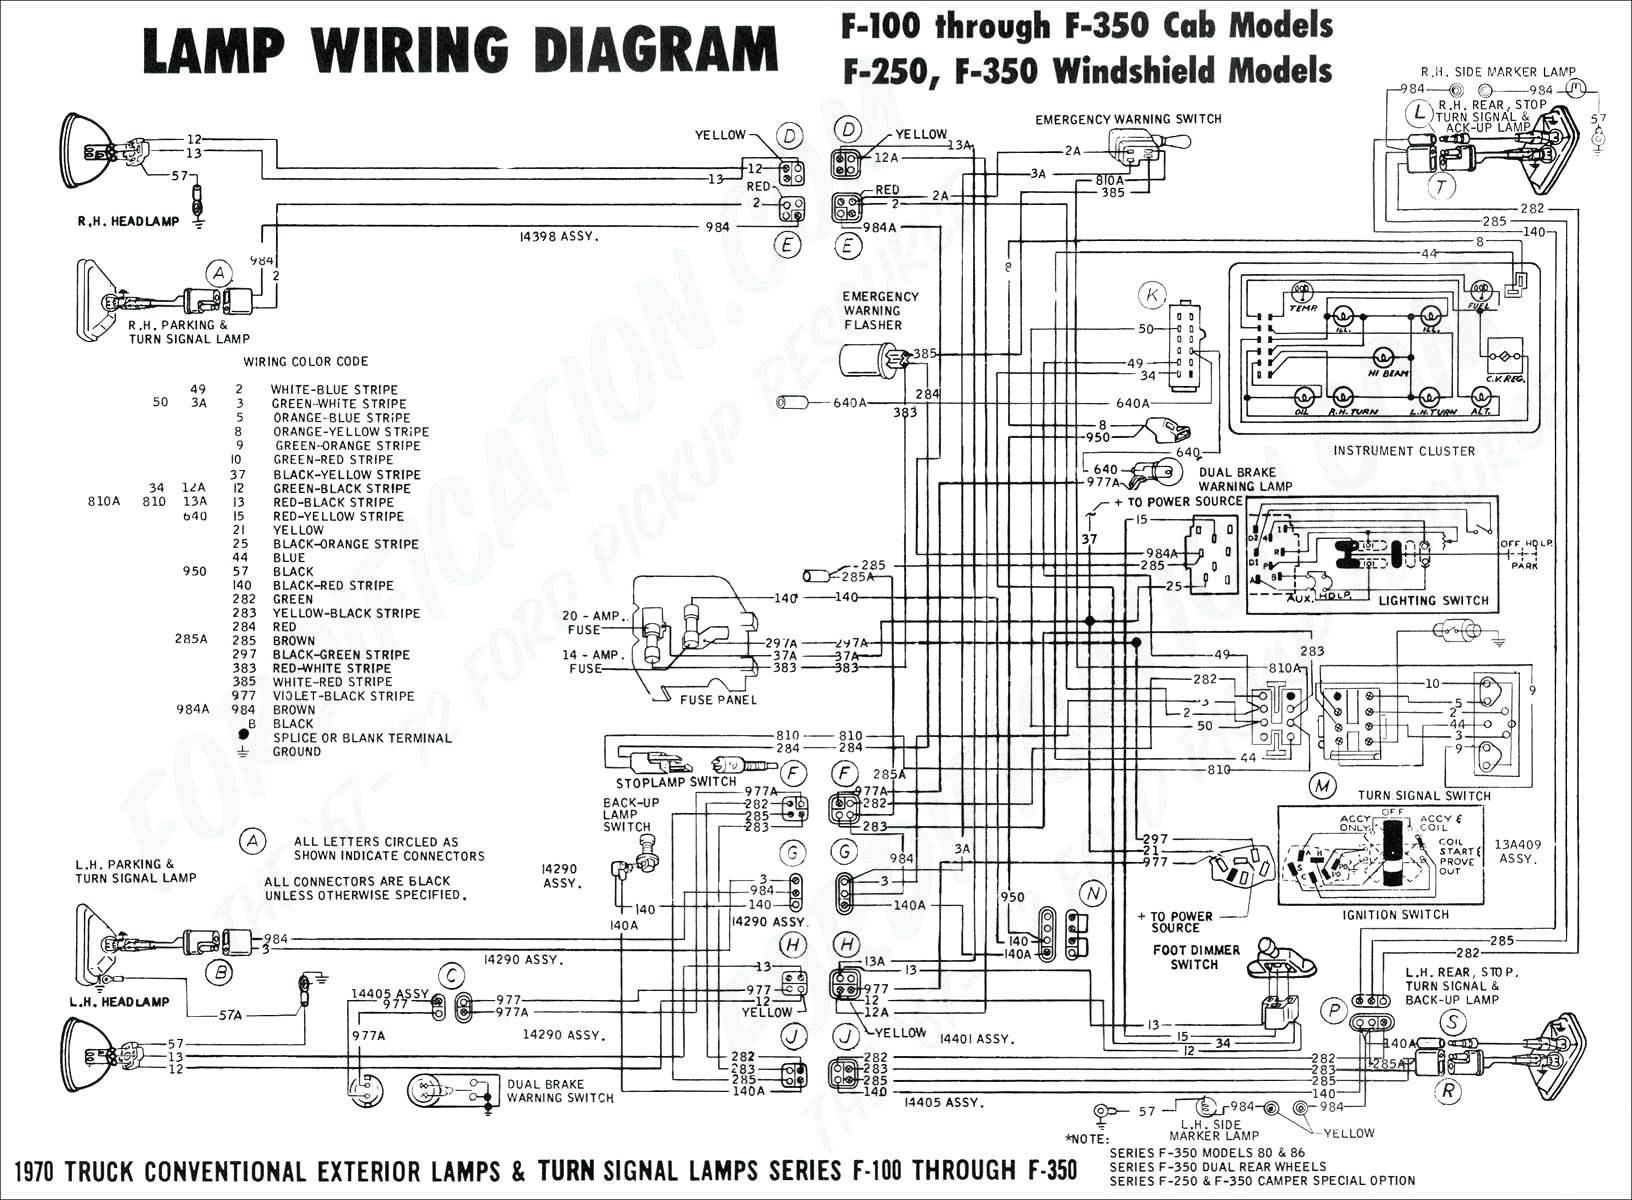 2006 Dodge Stratus Engine Diagram 2006 Dodge Wiring Diagram Another Blog About Wiring Diagram • Of 2006 Dodge Stratus Engine Diagram Wiring Diagram From 208v Another Blog About Wiring Diagram •